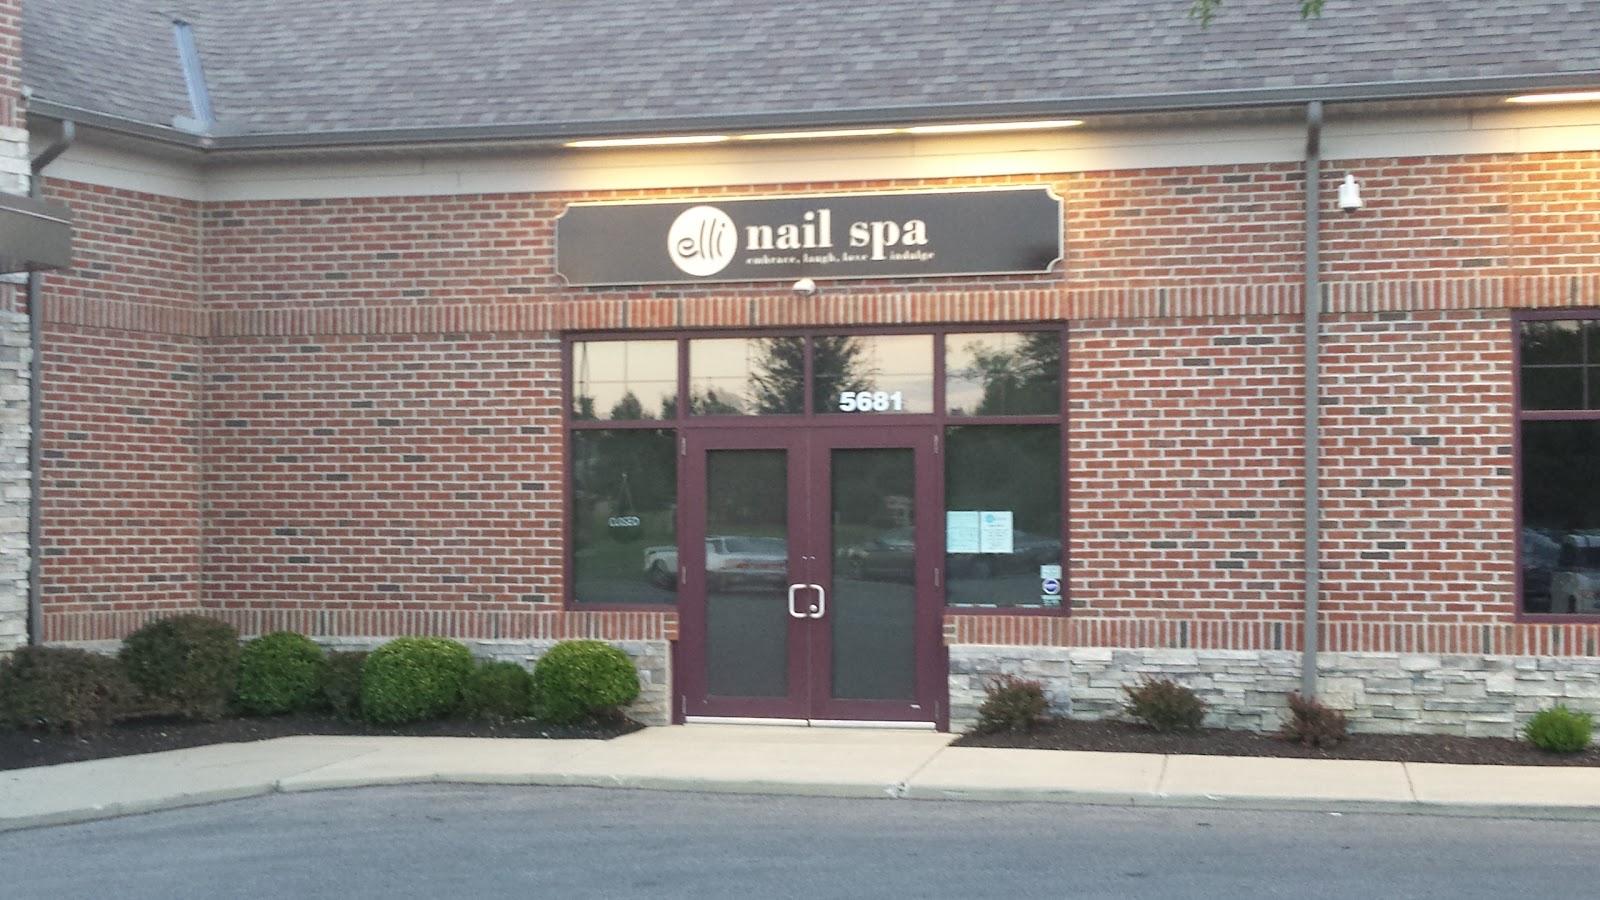 ELLI Nail Spa - Dublin, 5681 Woerner Temple Road, Dublin, Reviews ...